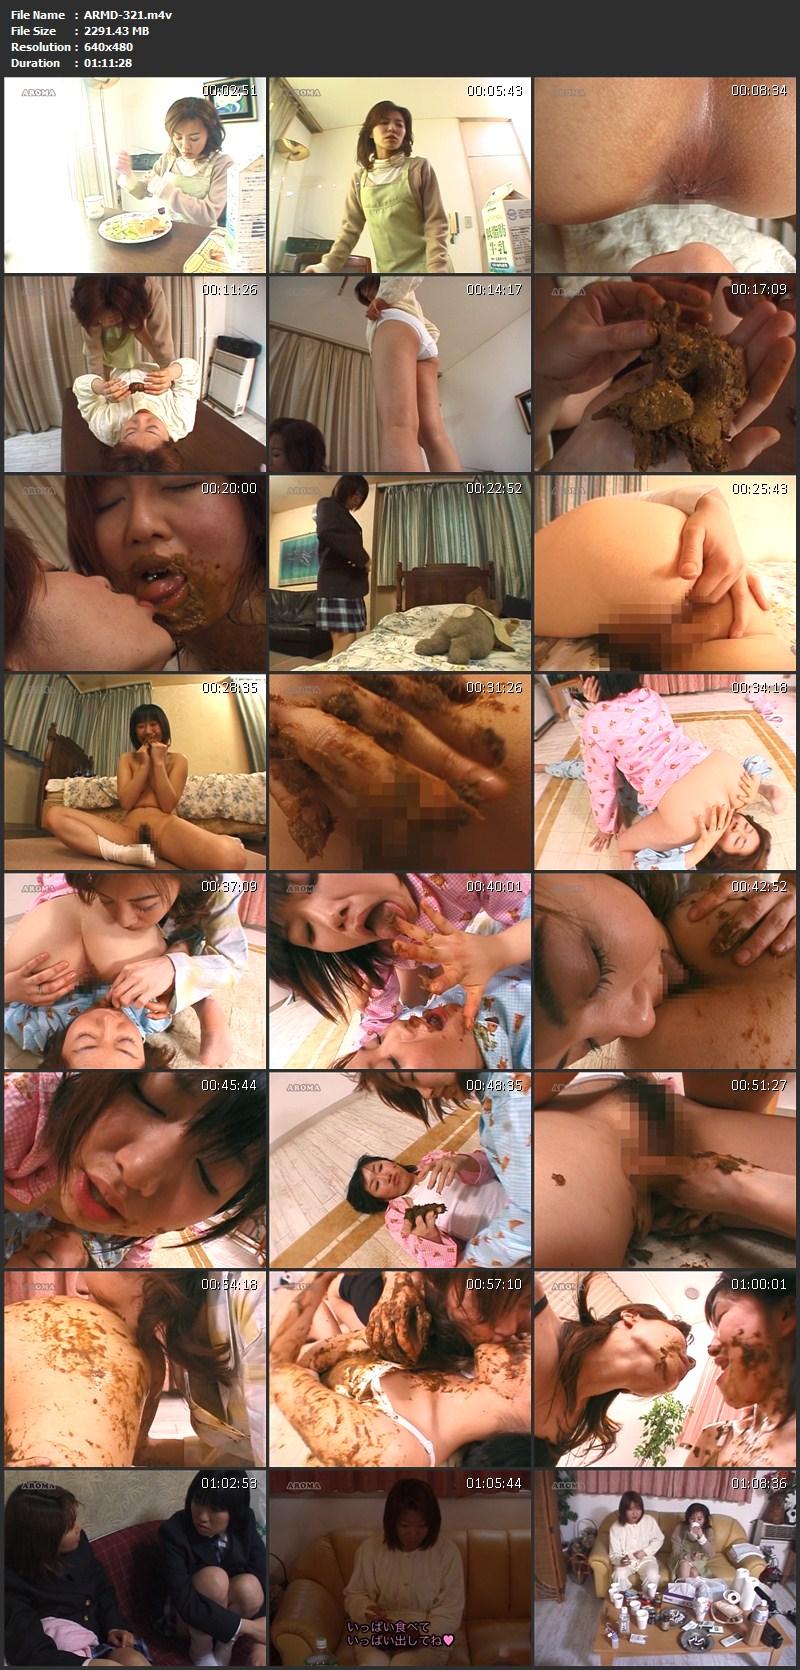 [ARMD-321] 刹奈紫之 おしっこDEチュー(DVD) Defecation レズ